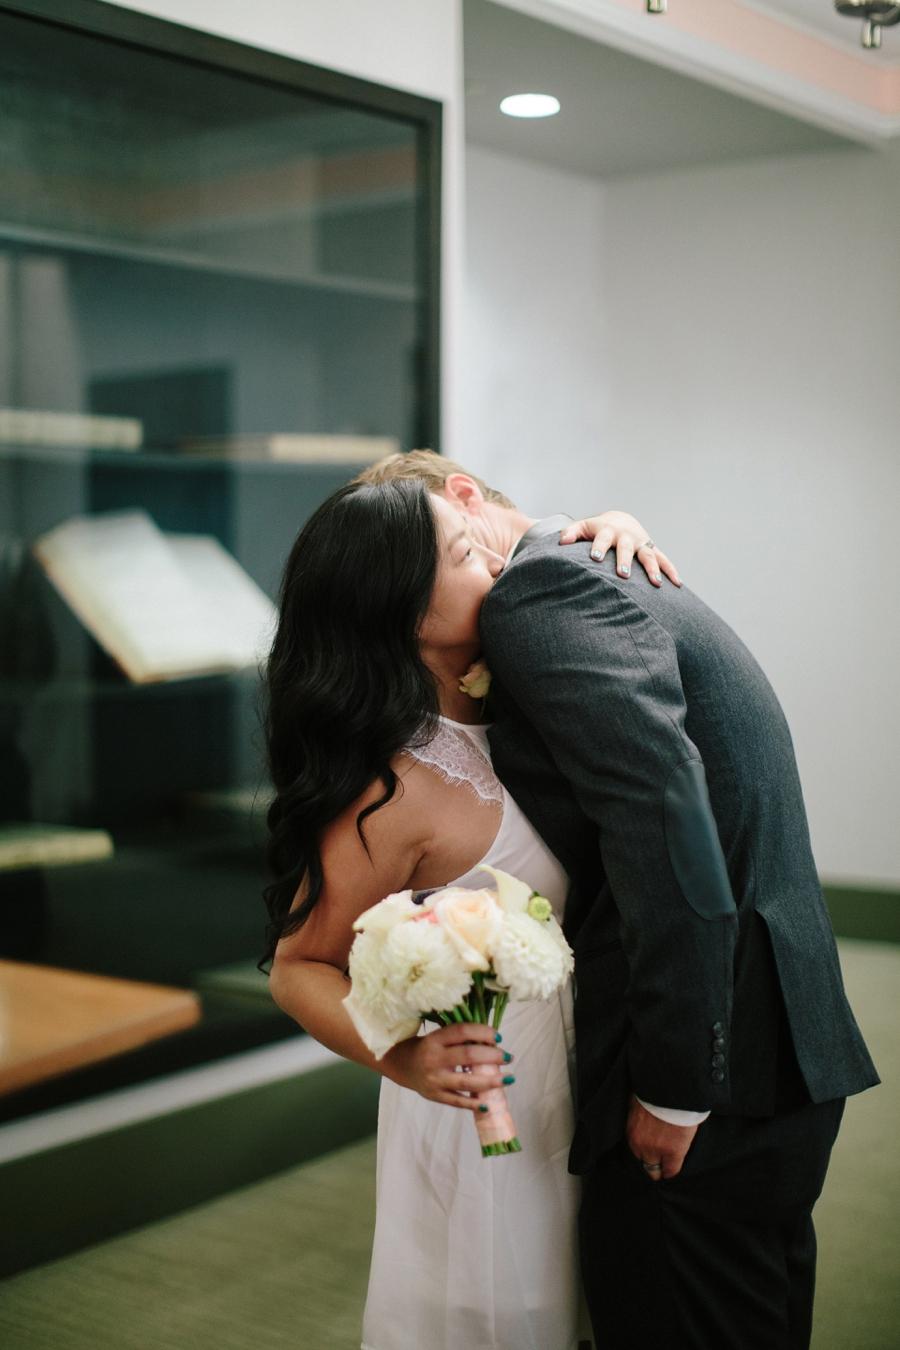 elopement-wedding-photographer-ny-nj-destination_0015.jpg